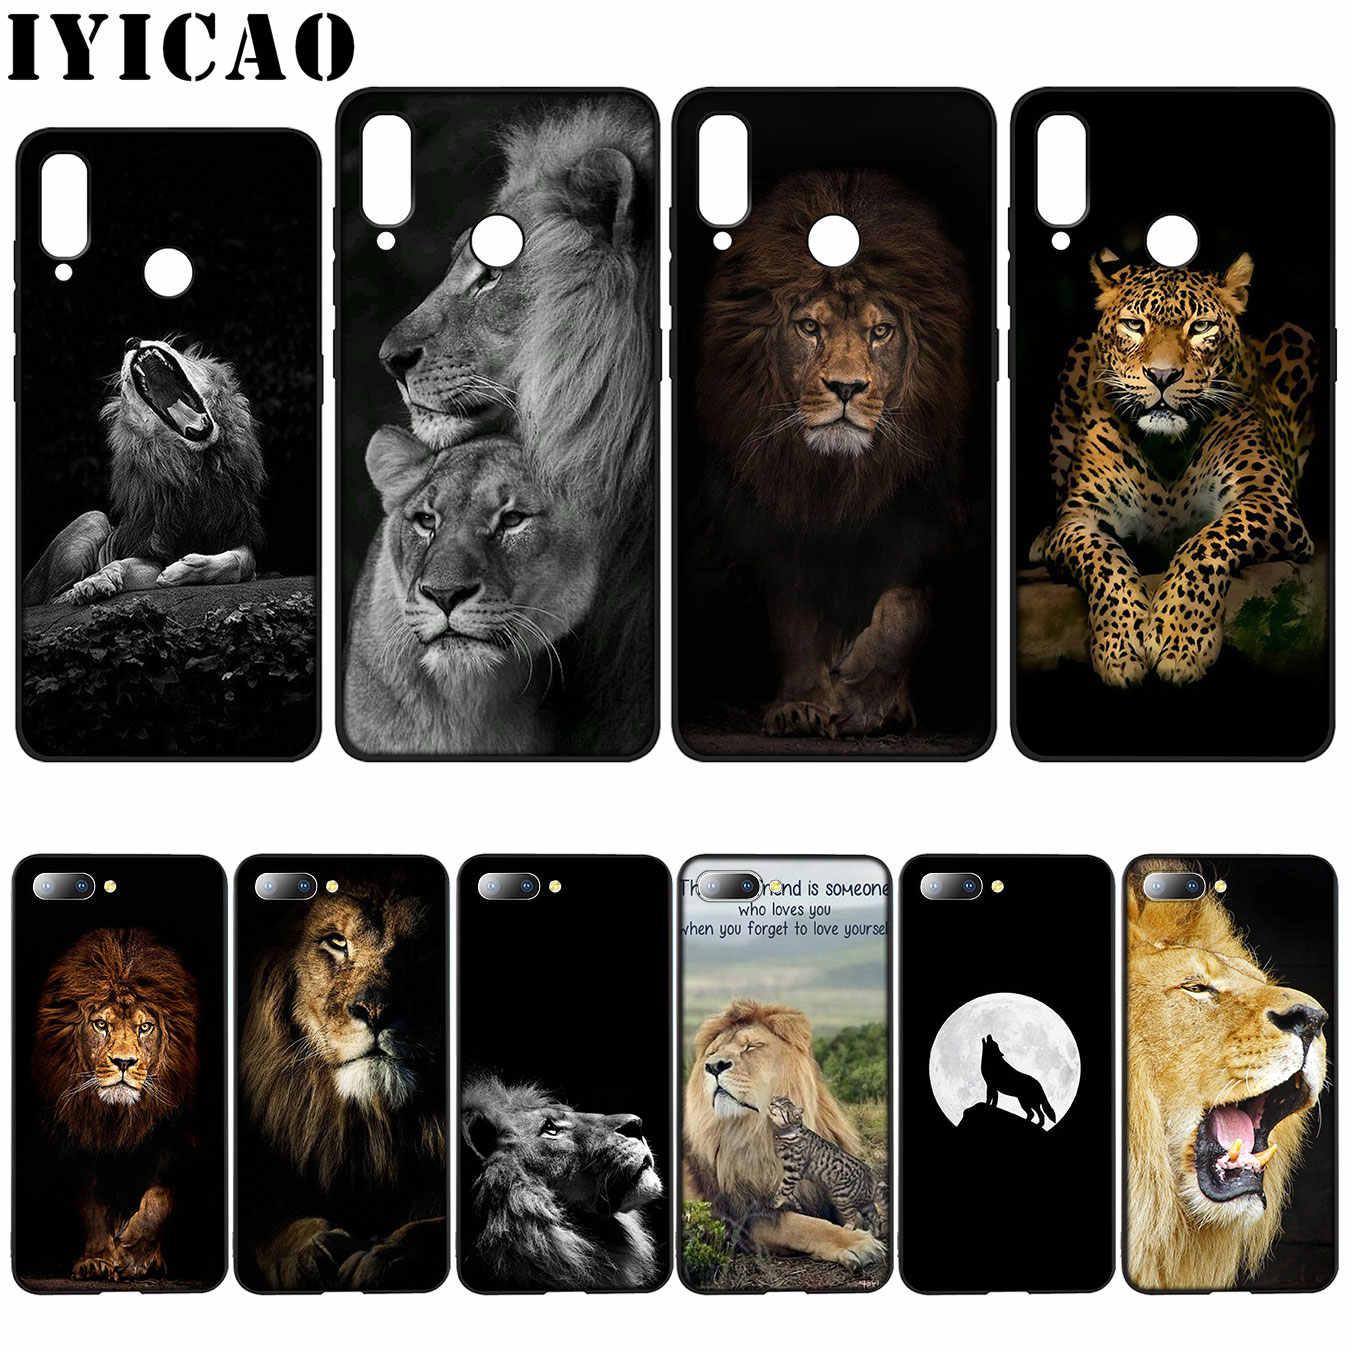 IYICAO 動物キングタイガーライオンシリコーン Huawei 社の Y7 Y6 首相 Y9 2018 名誉 8C 8 × 8 9 10 Lite 6A 7C 7X 7A プロ